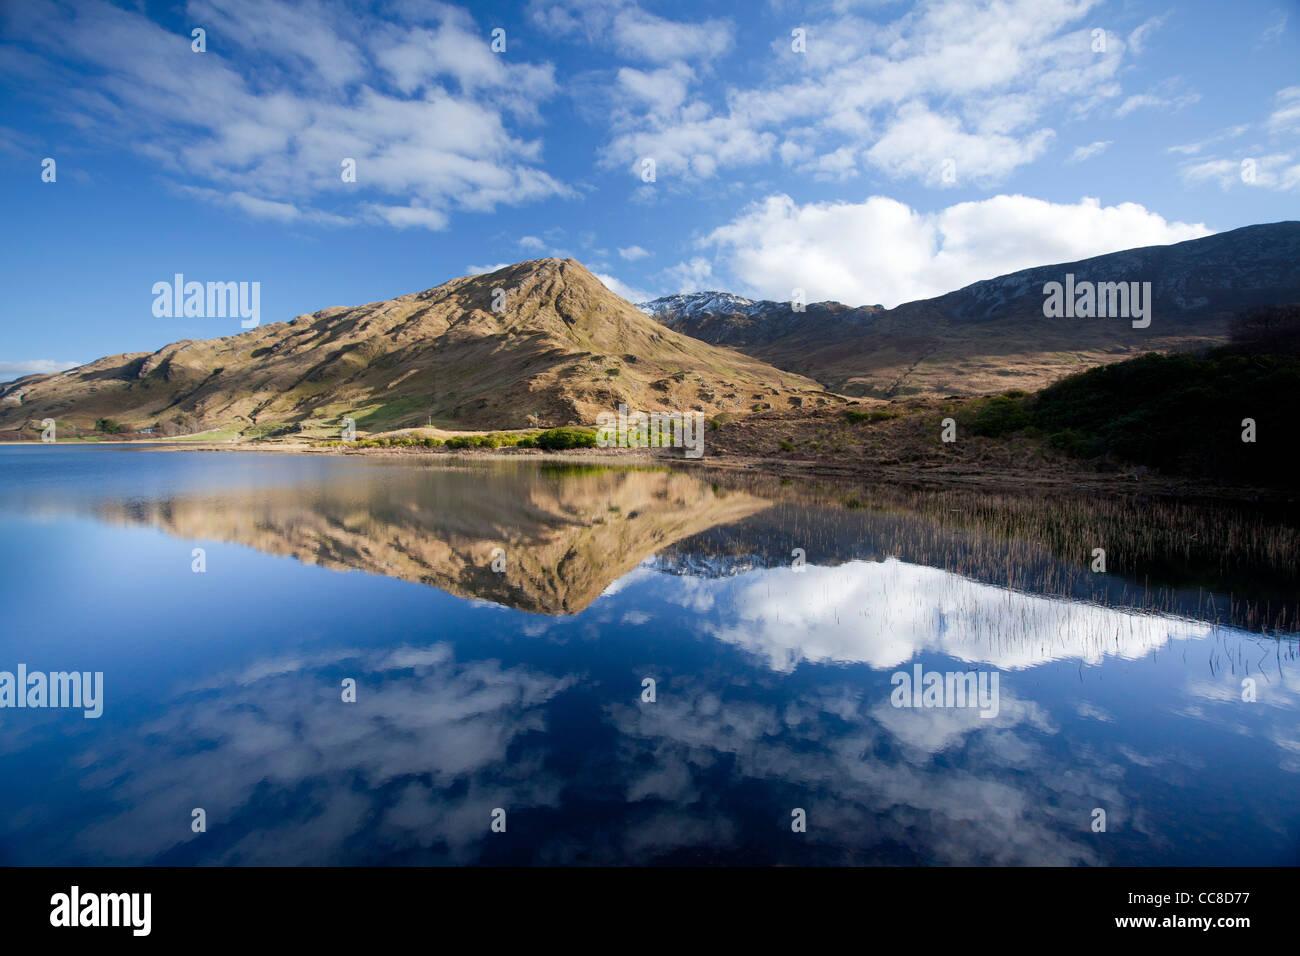 Reflection of Benbaun Mountain in Kylemore Lough, Connemara, County Galway, Ireland. - Stock Image